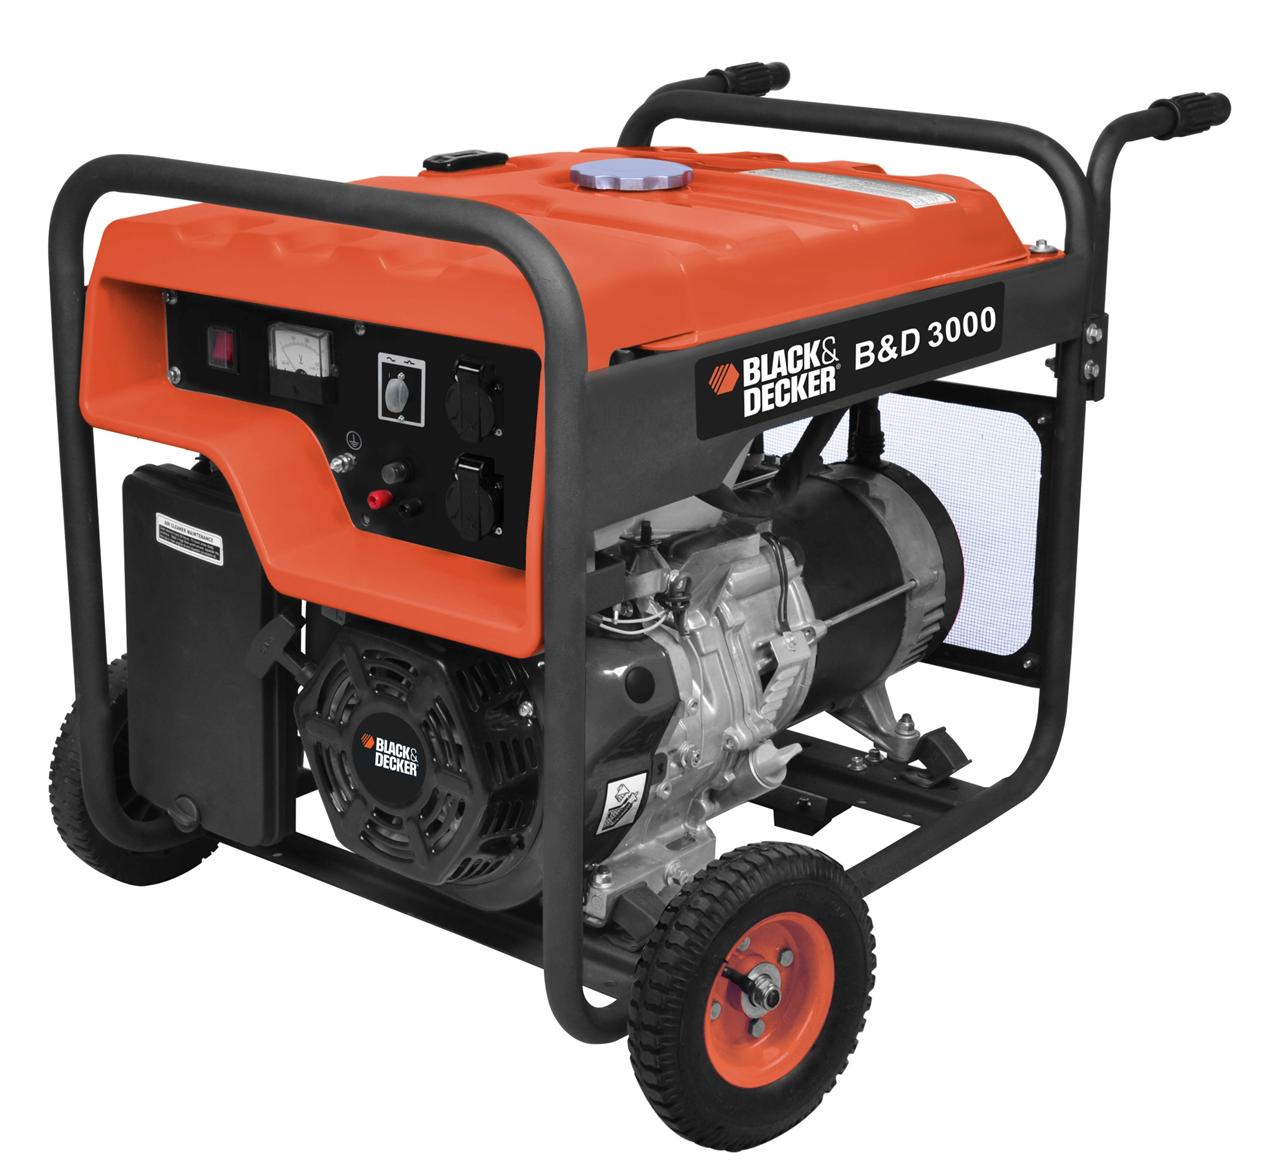 Black & Decker BD 3000 Petrol Generator